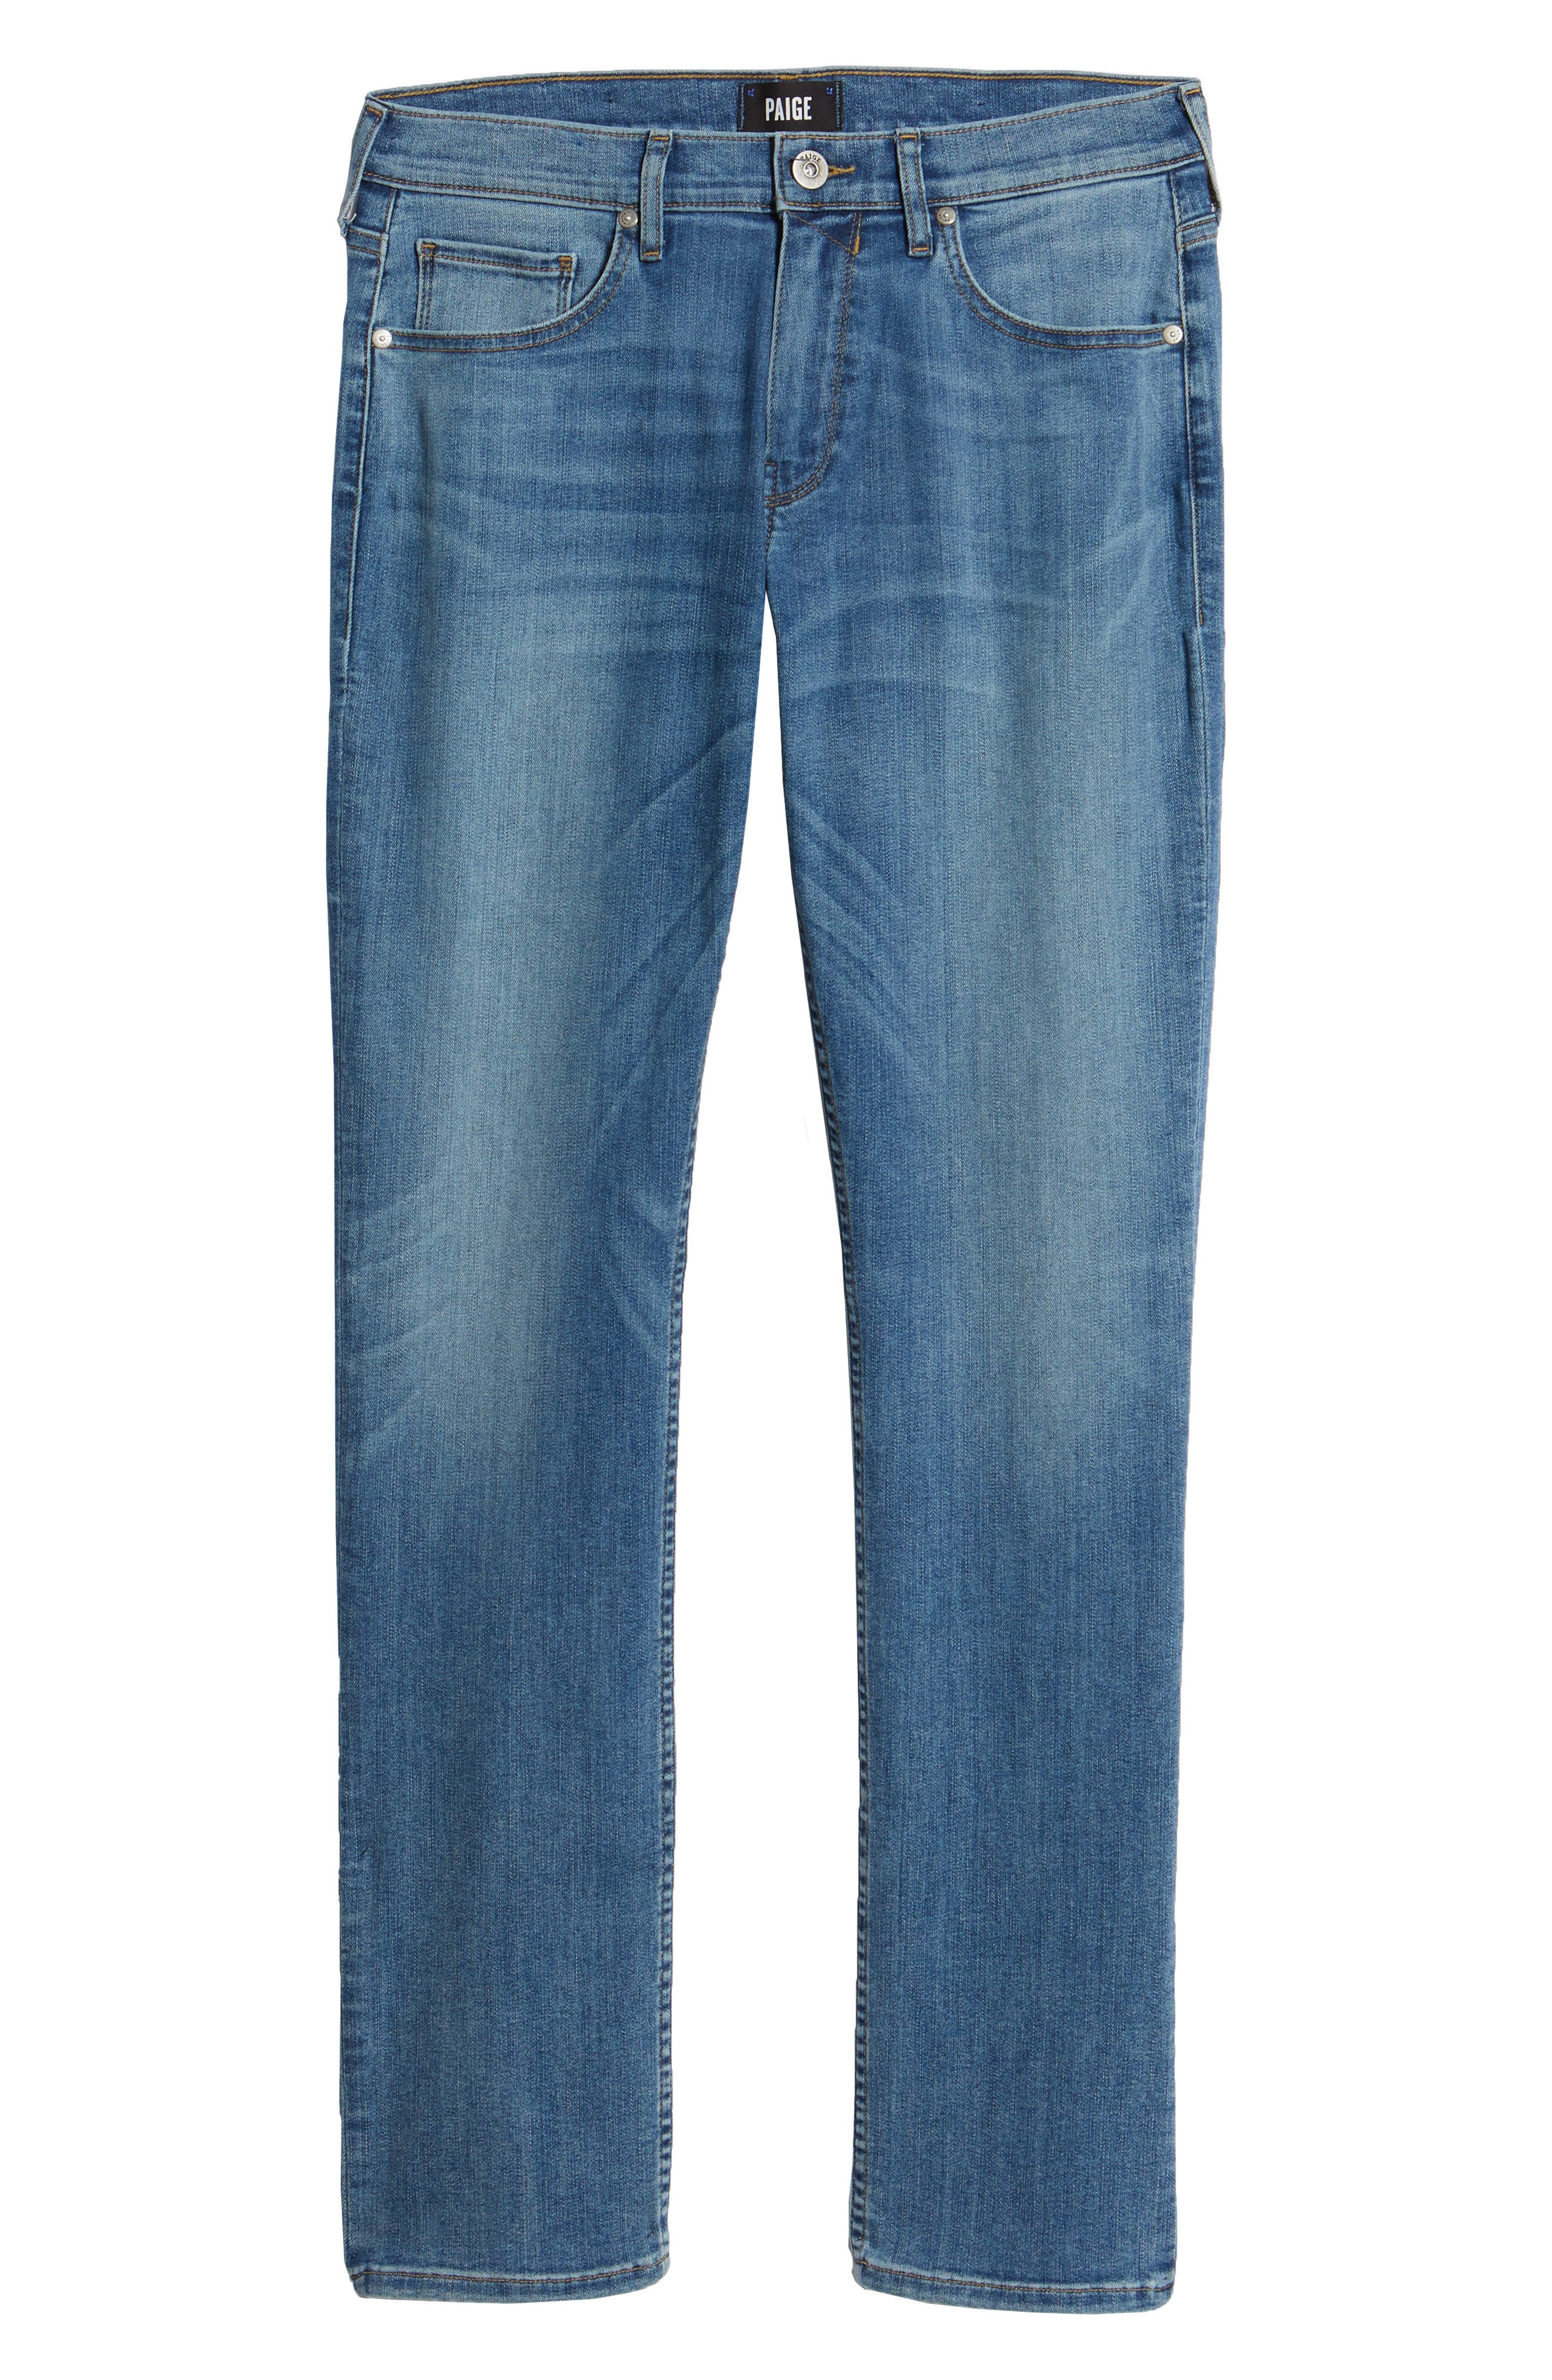 PAIGE,                             Federal Slim Straight Leg Jeans,                             Alternate thumbnail 6, color,                             400